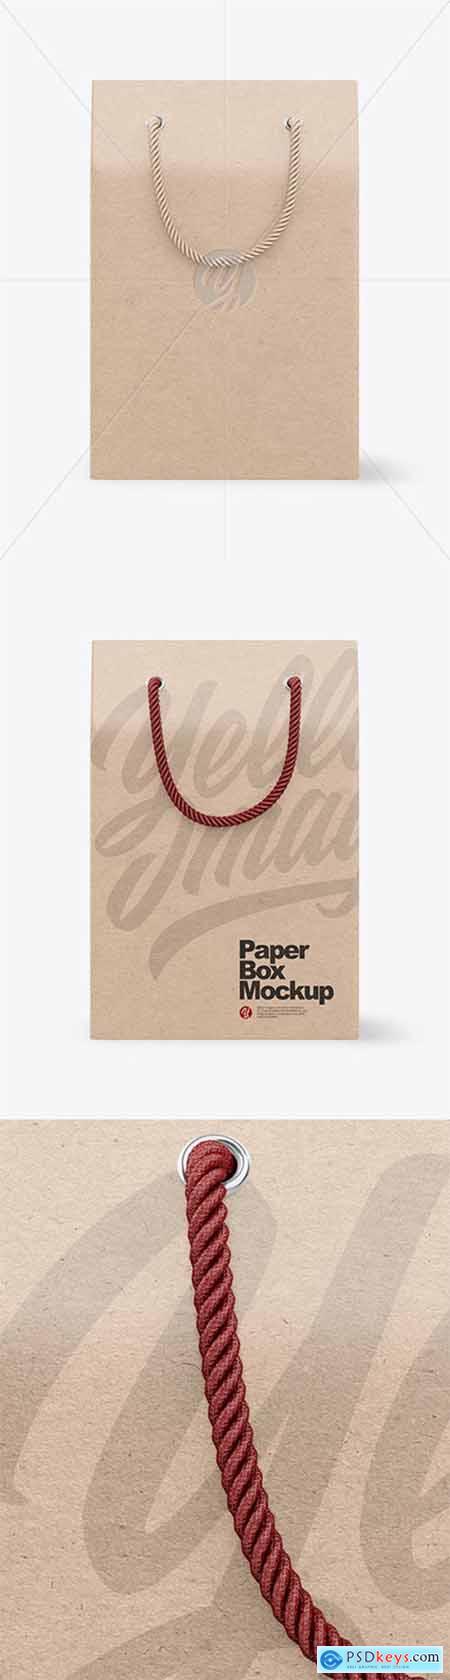 Kraft Paper Box with Handles Mockup 79364